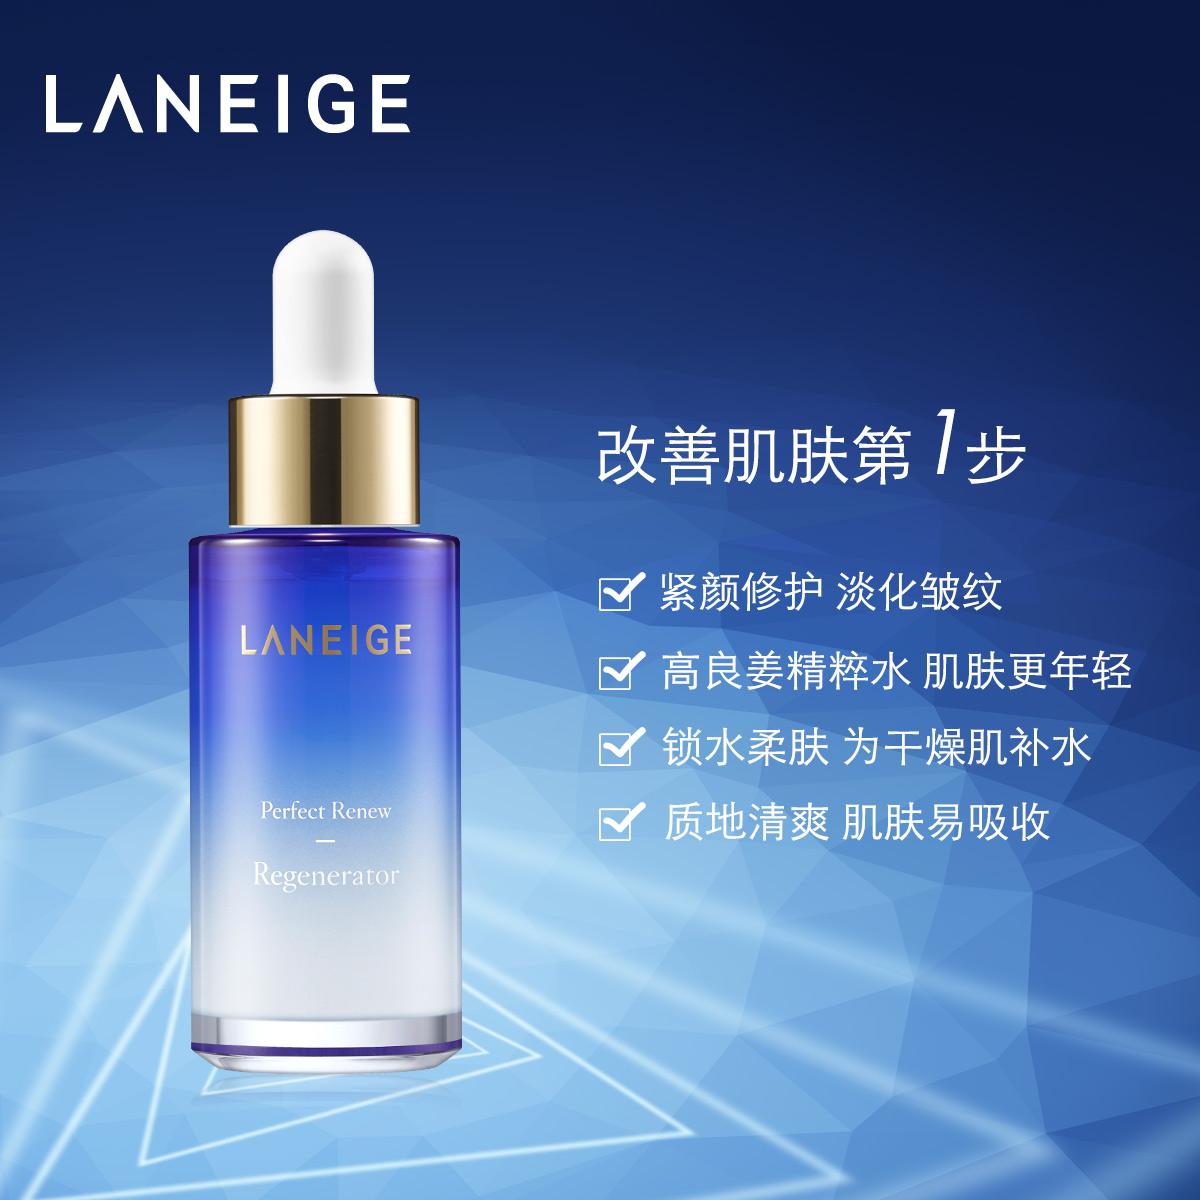 laneige 緊致肌膚  蘭芝致美緊顏修護精華液補水保濕